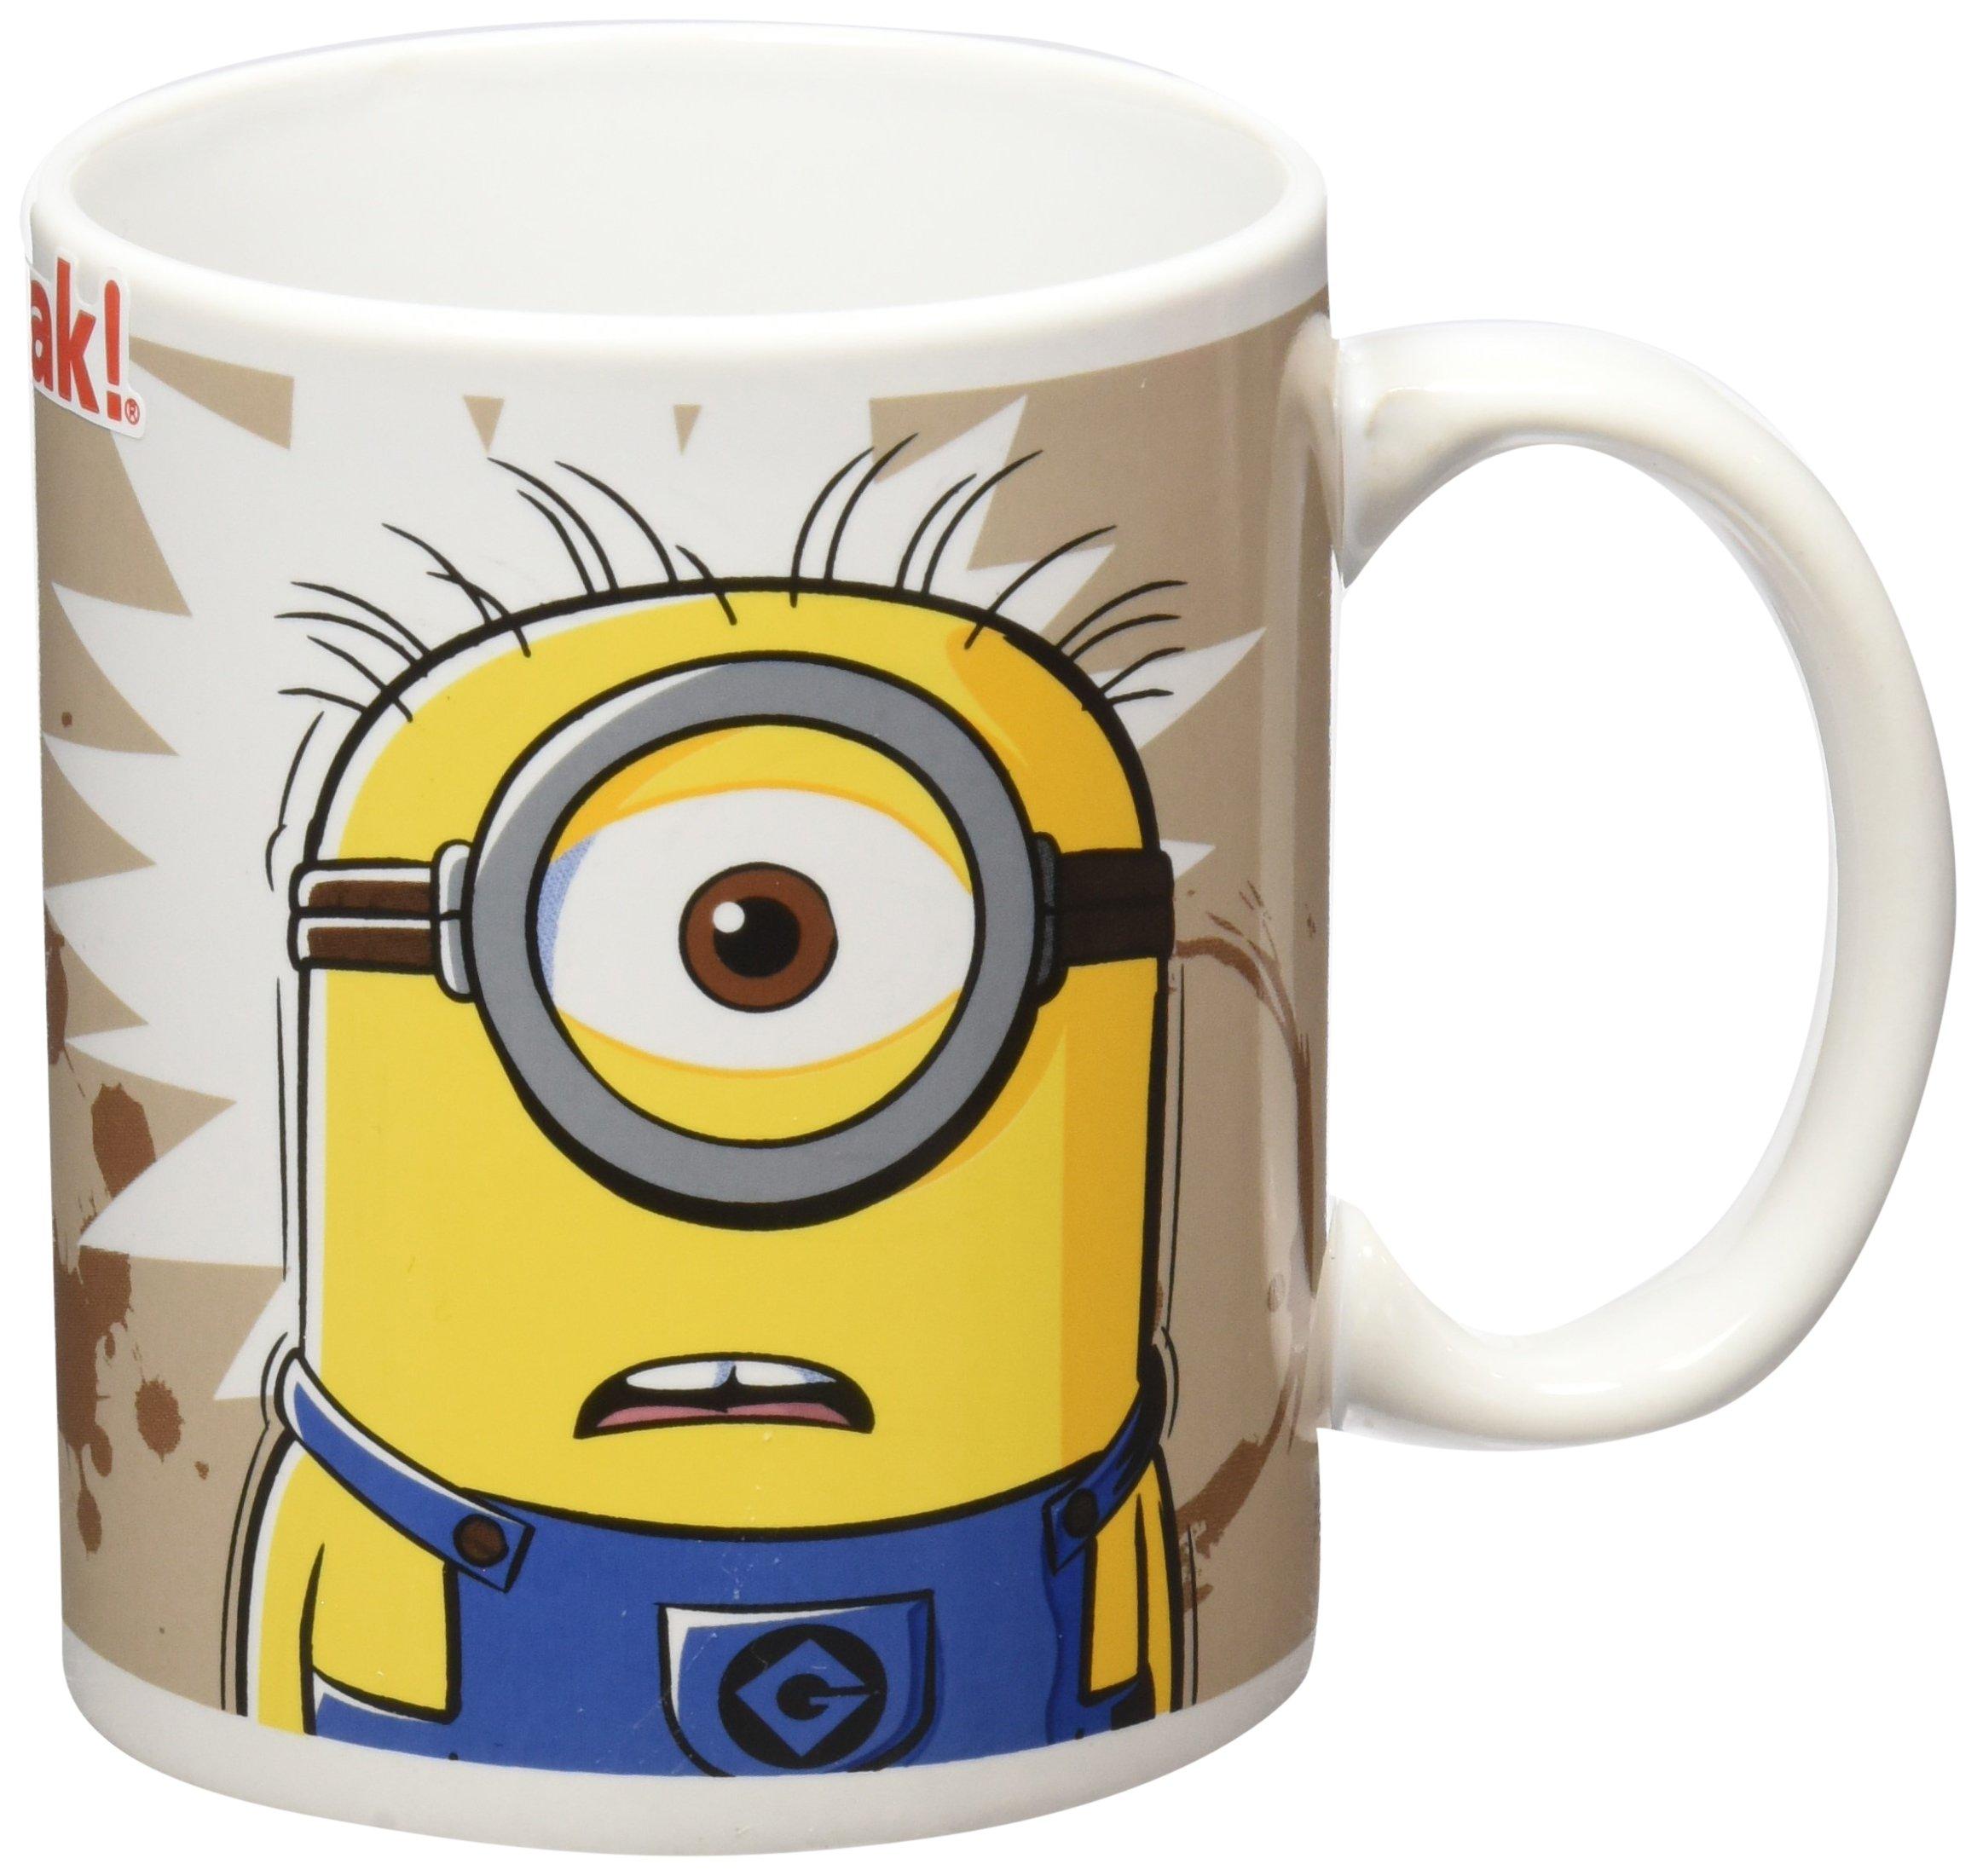 Zak Designs Despicable Me Minion I Need Coffee Mug, 11.5 oz